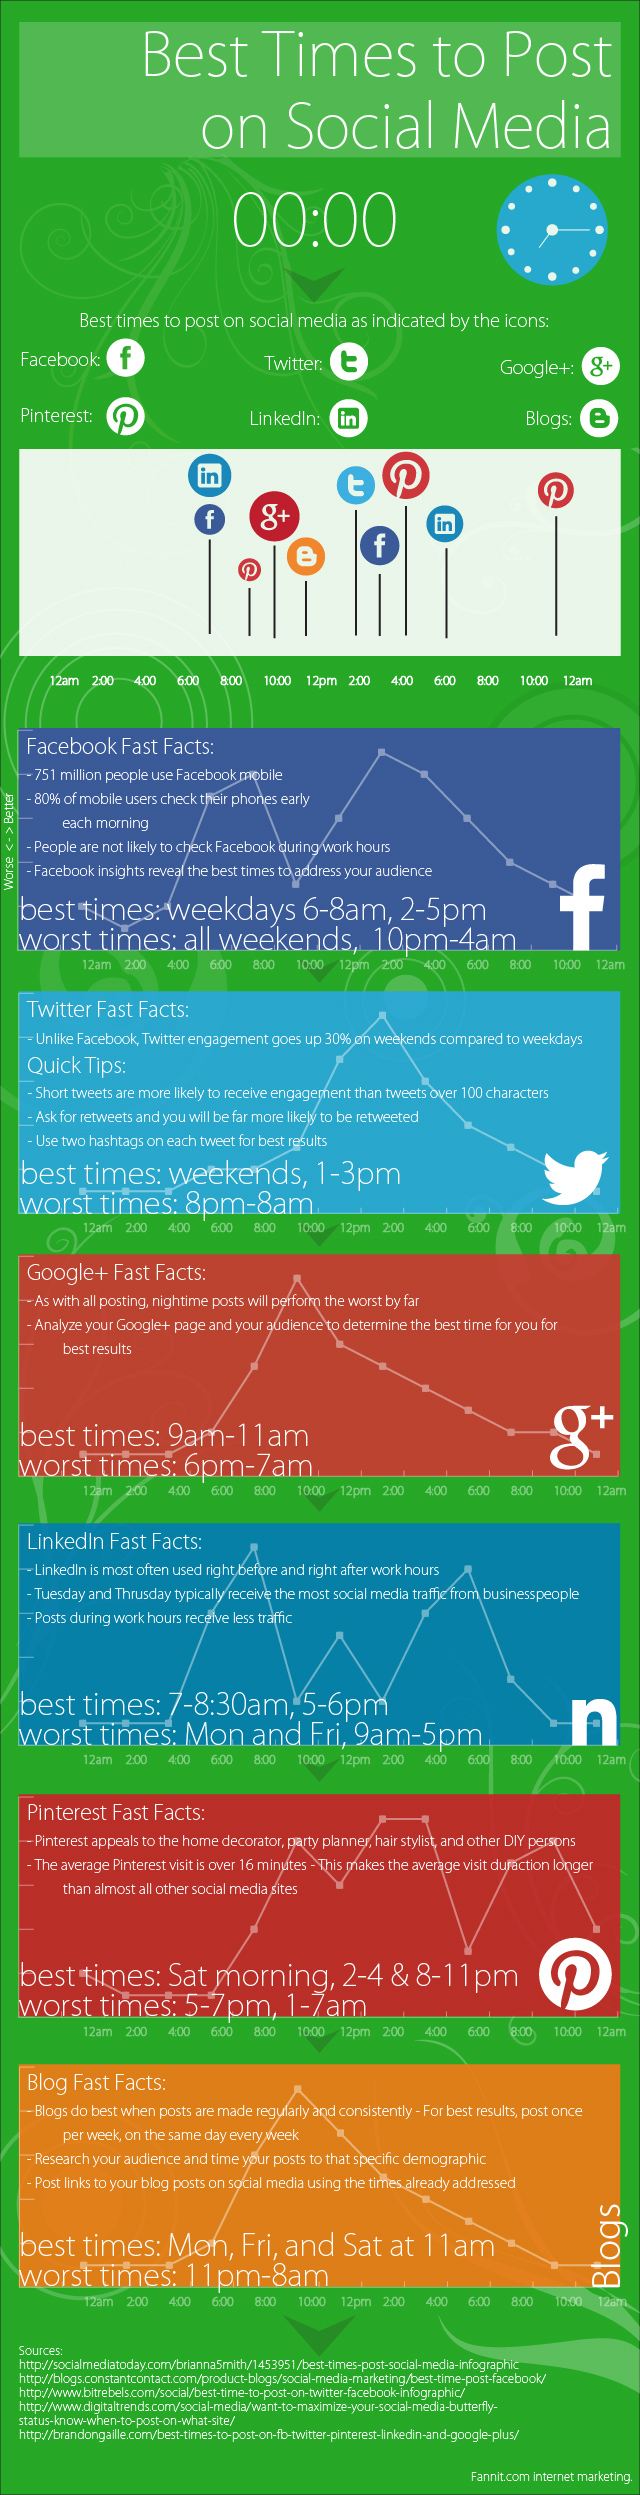 social-media-best-times-post